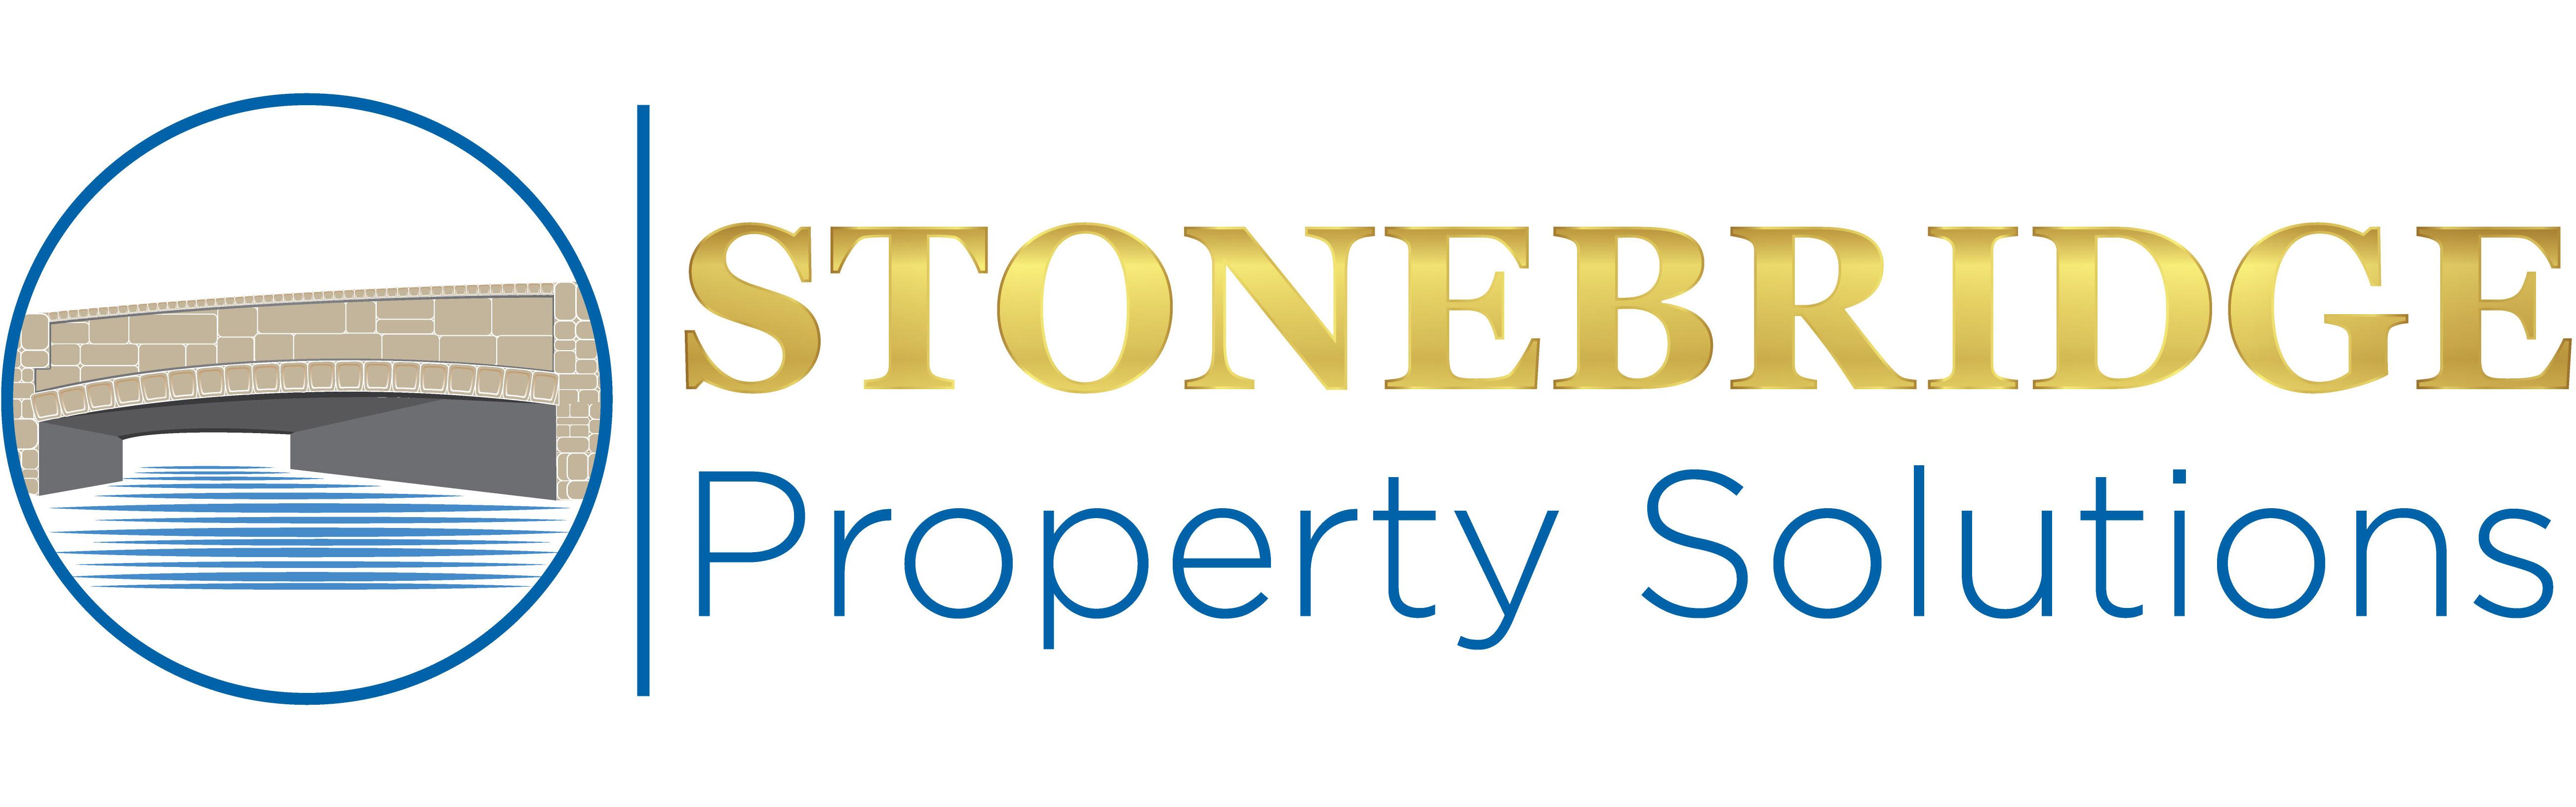 Stonebridge Property Solutions, LLC